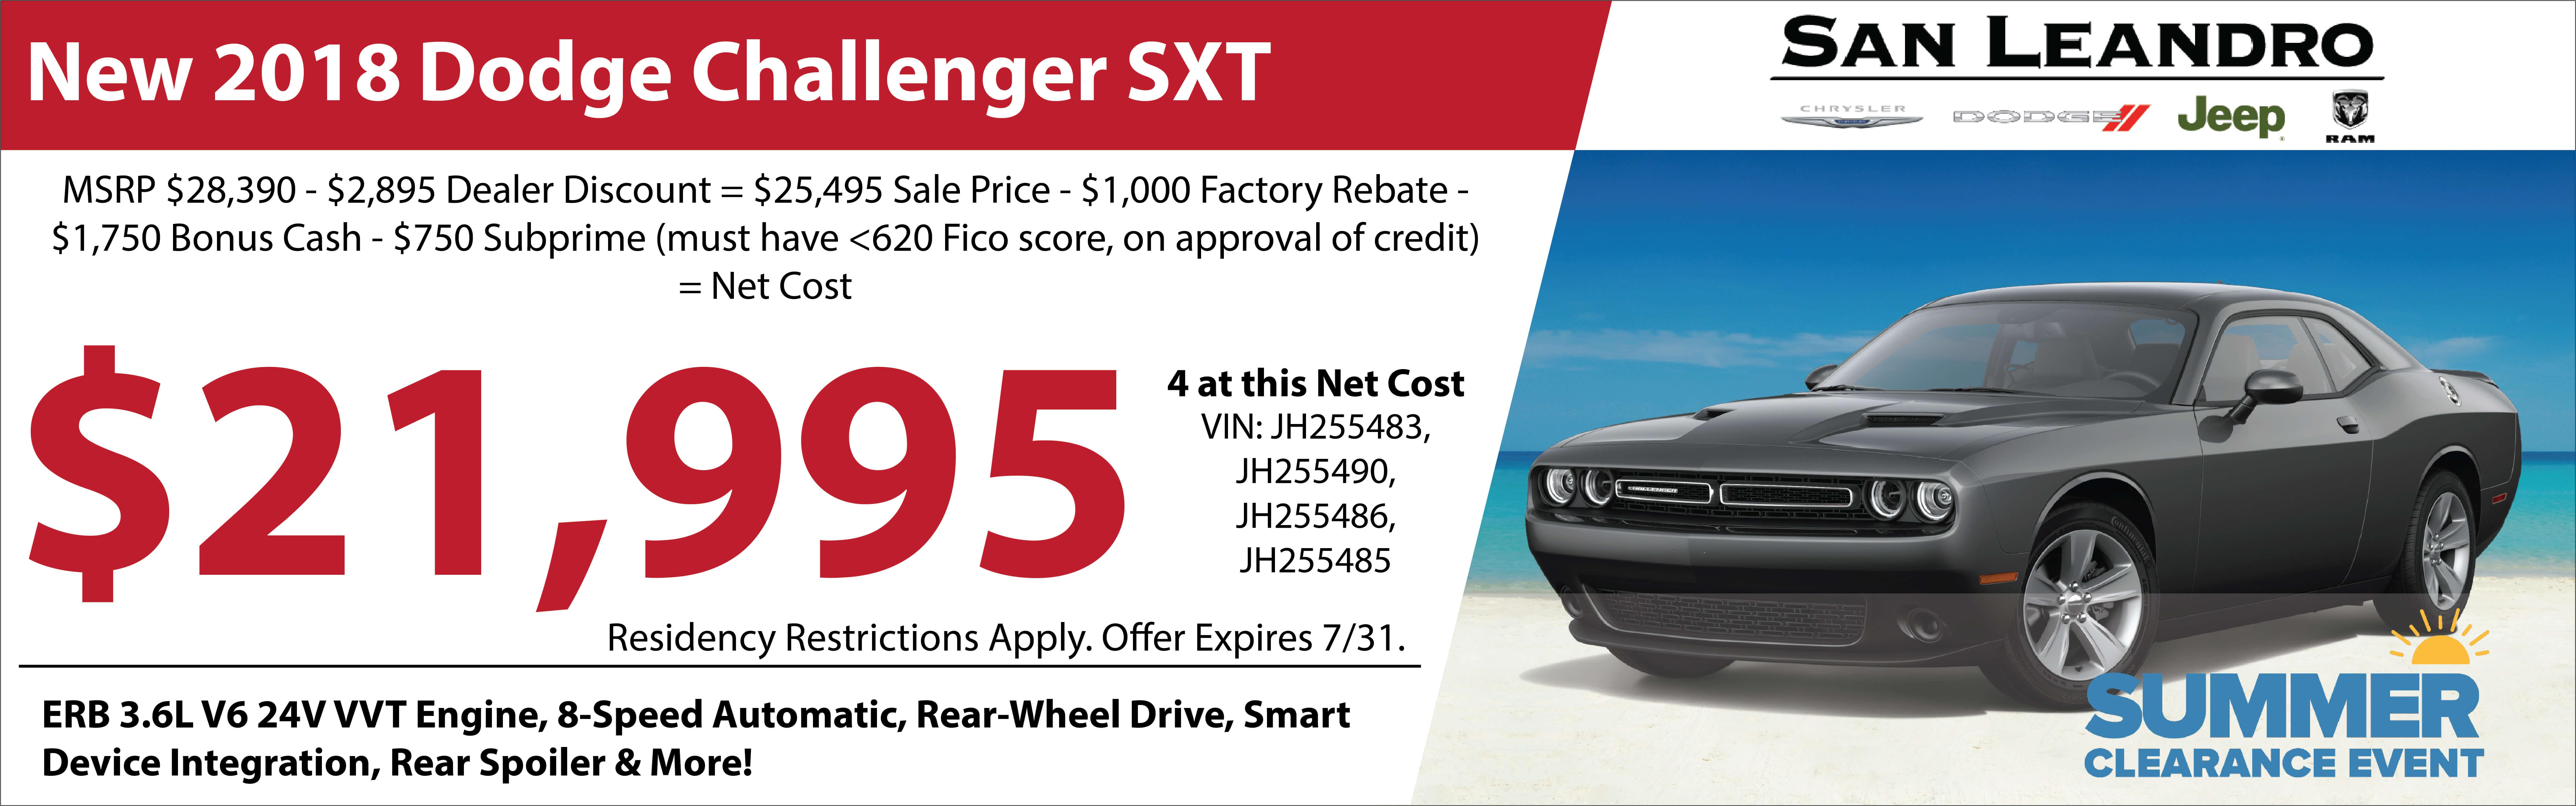 Dodge Dealer San Leandro